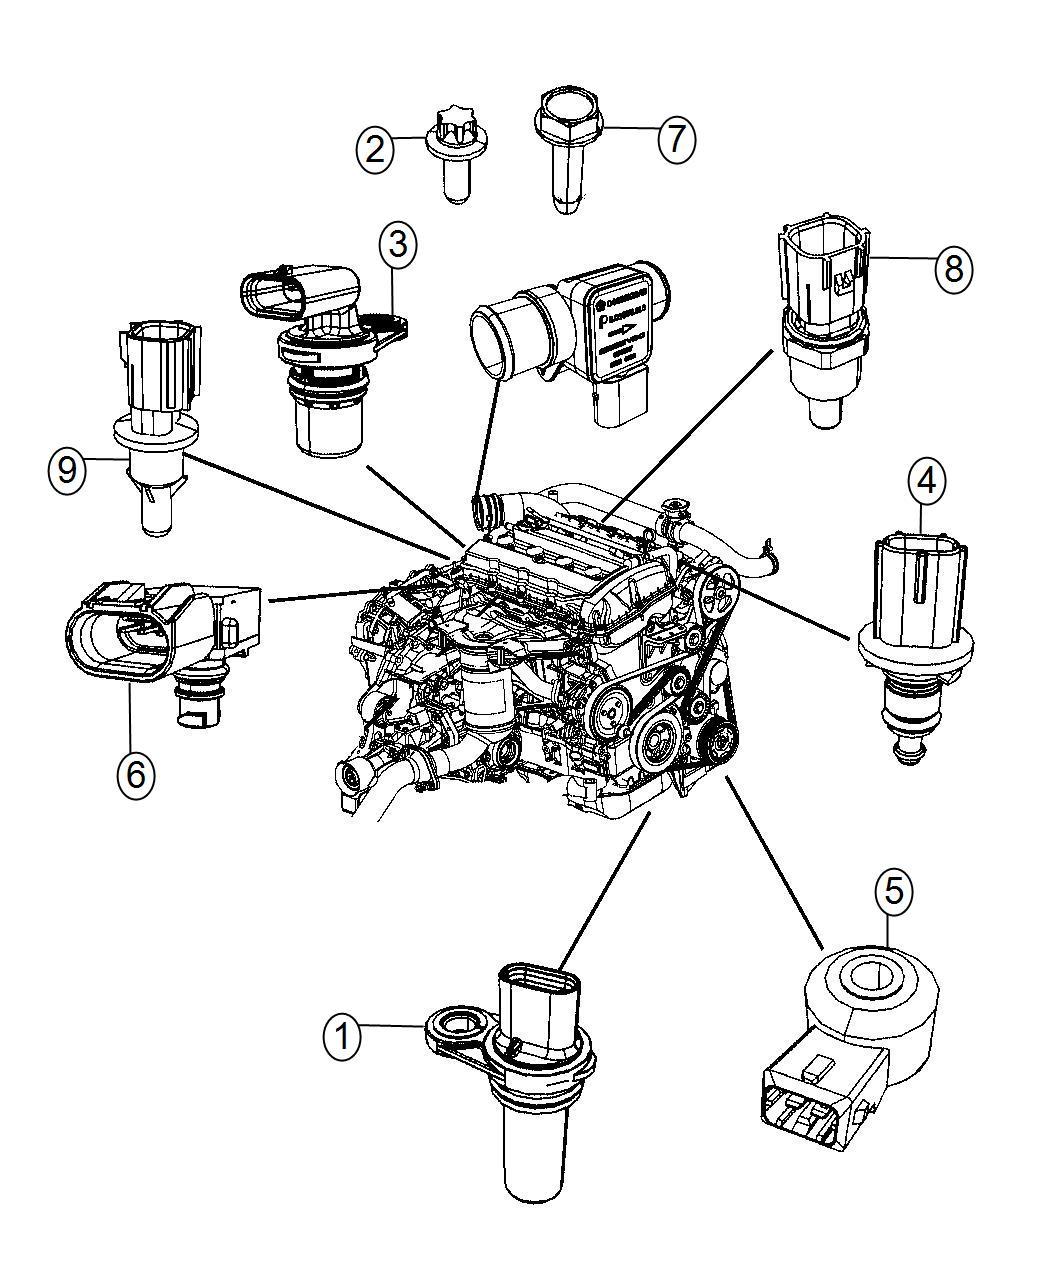 2014 Dodge Journey Sensor. Coolant temperature. [power